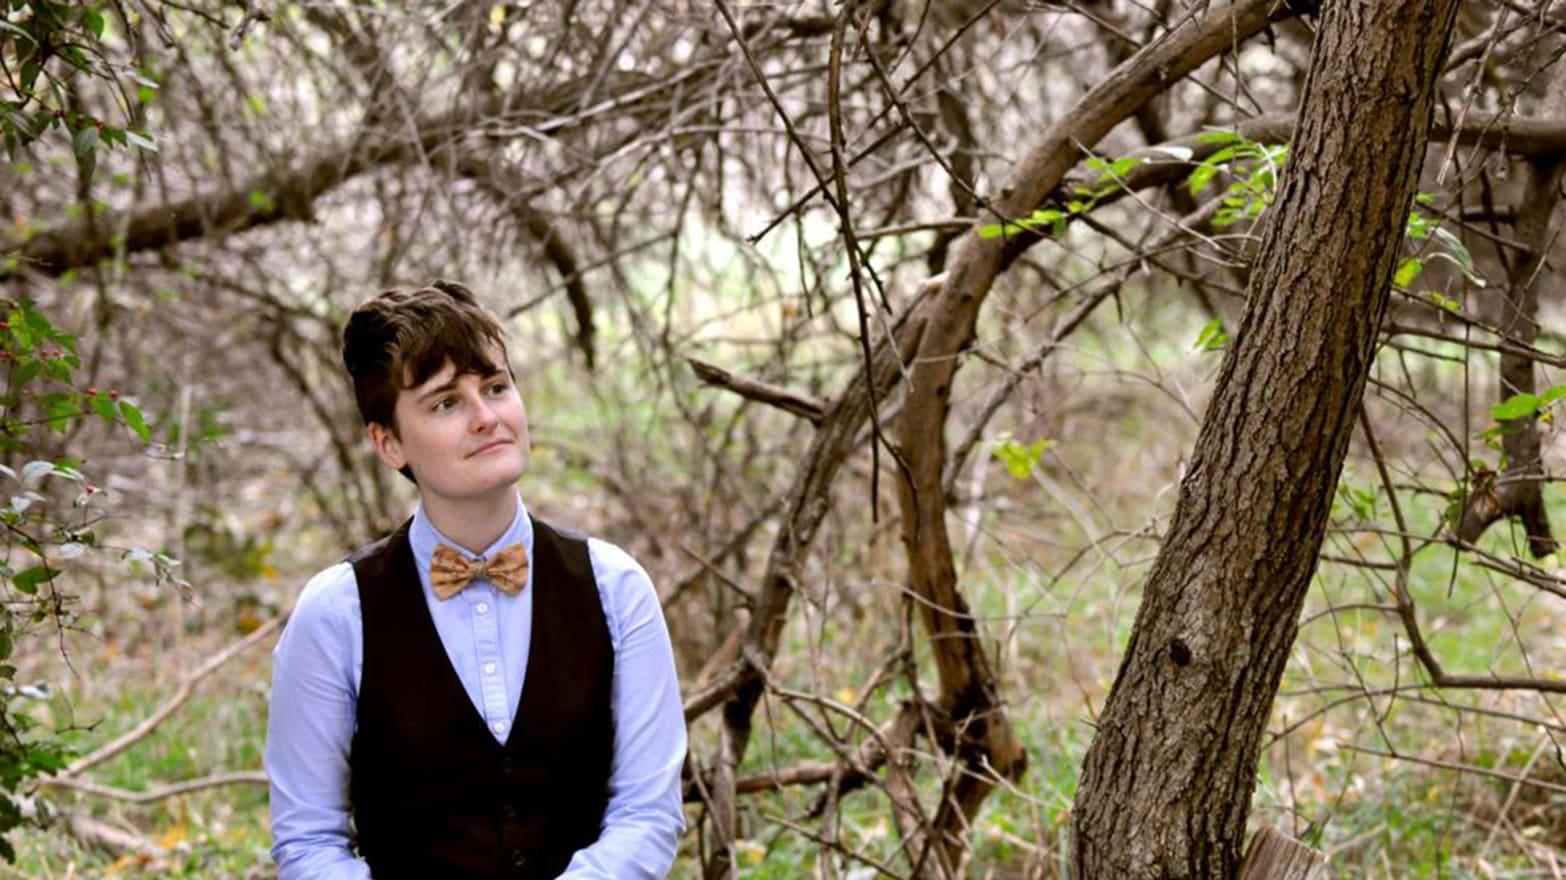 Murdered Boise Student Sierra Bush Was Gender Fluid, Inspired Others